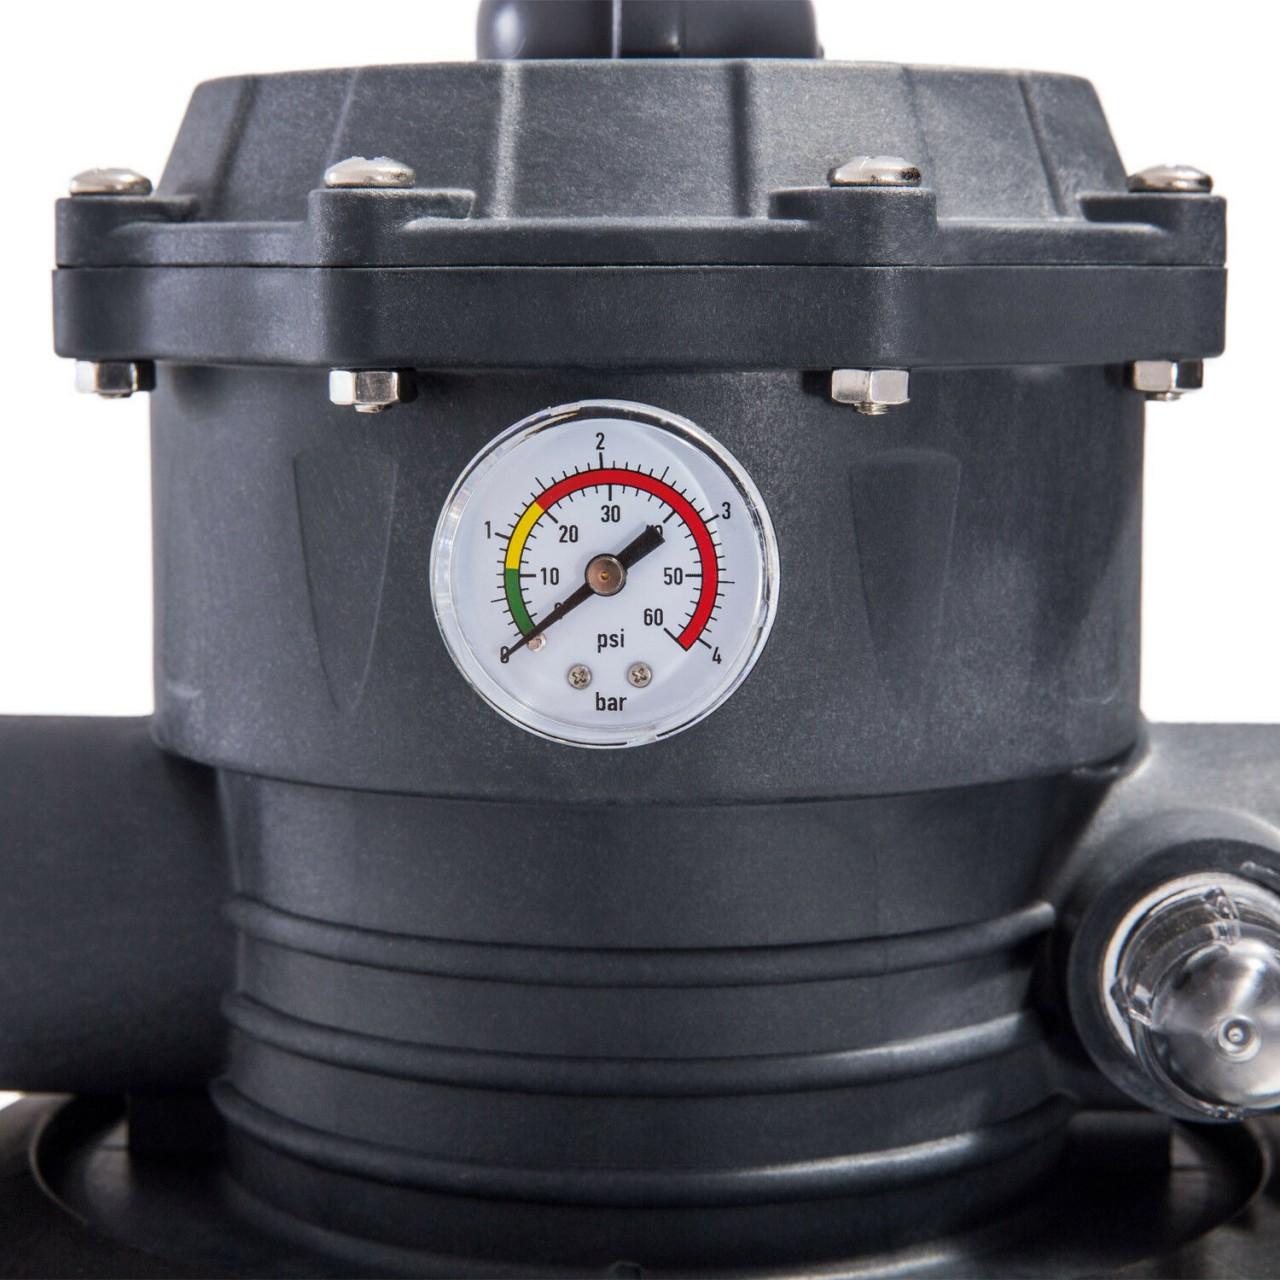 Intex 26644 Sandfilteranlage 4m³/h Filterpumpe 4000 l/h Filterkessel für Pool